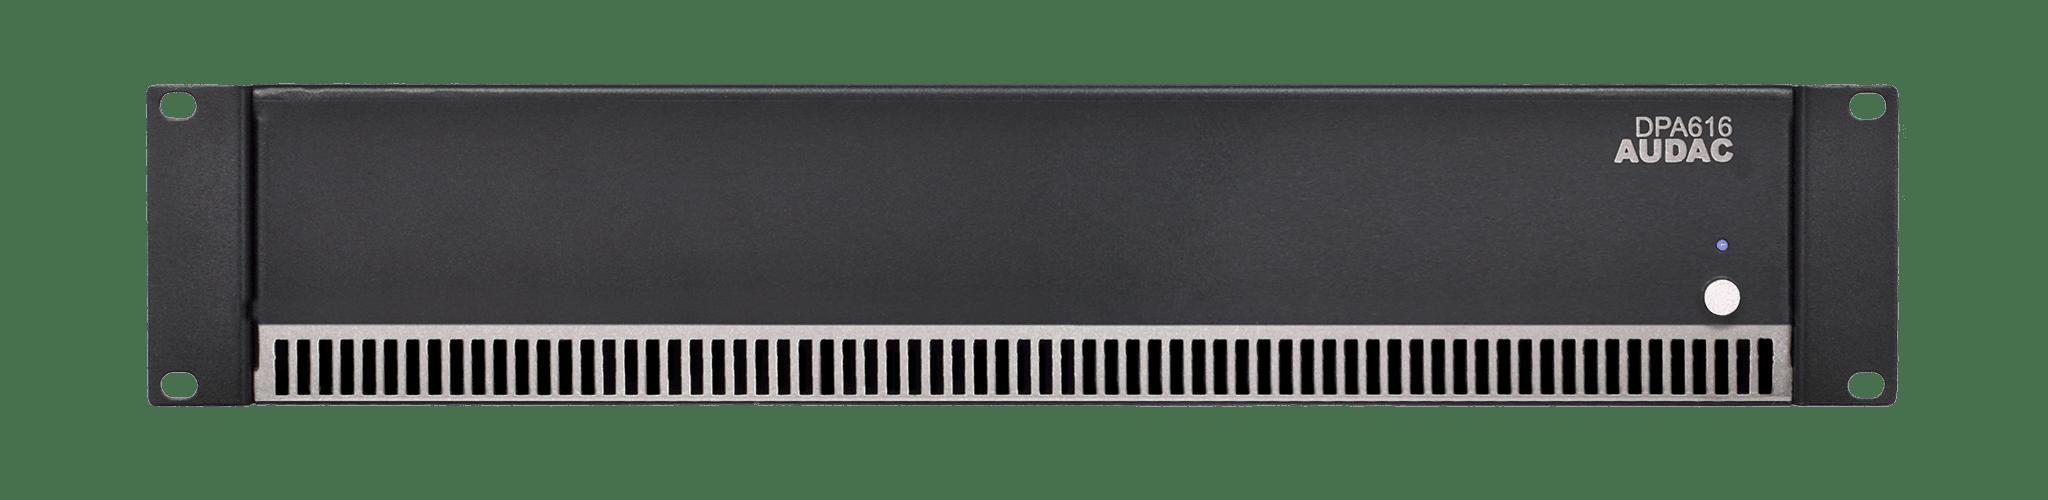 DPA616 - Sixteen-channel Class-D amplifier 16 x 60W